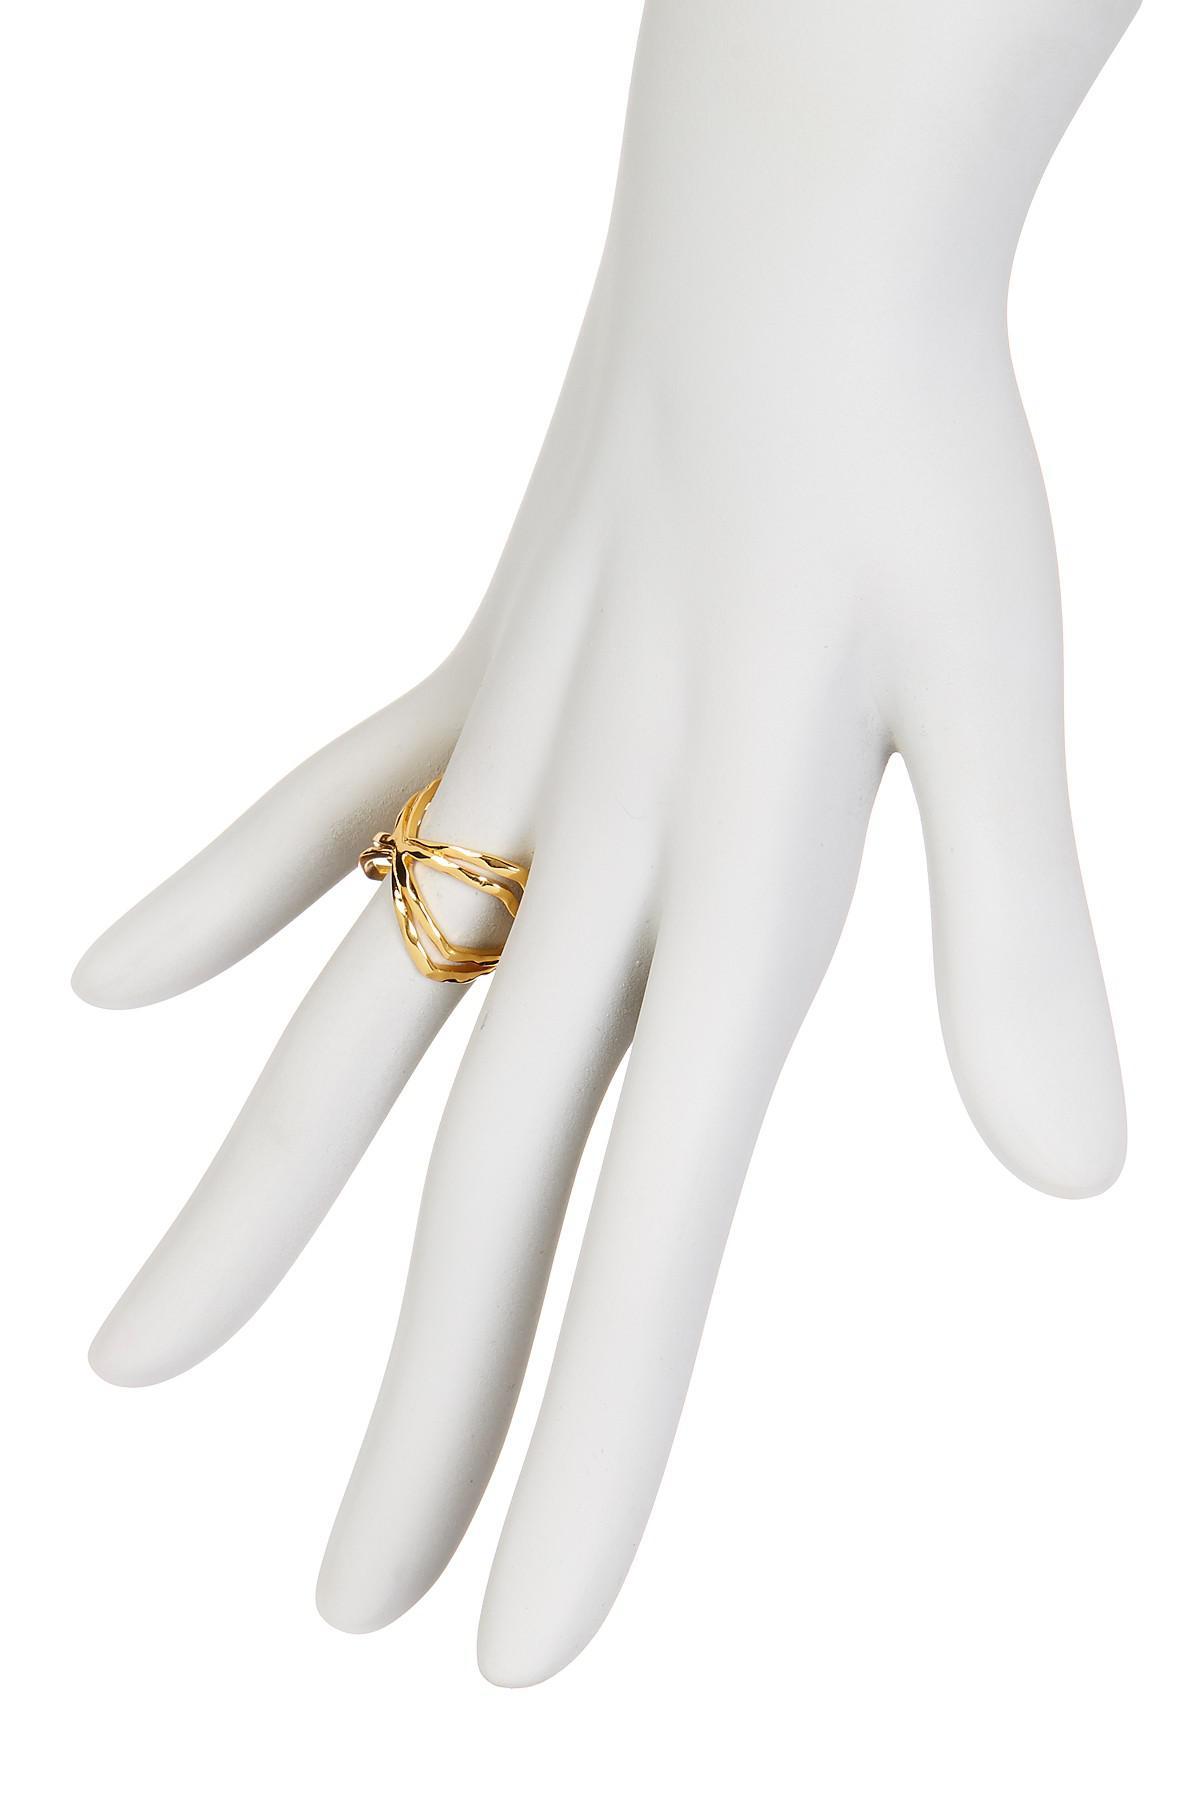 Gorjana Skyler Crisscross Cuff Ring, Size 6